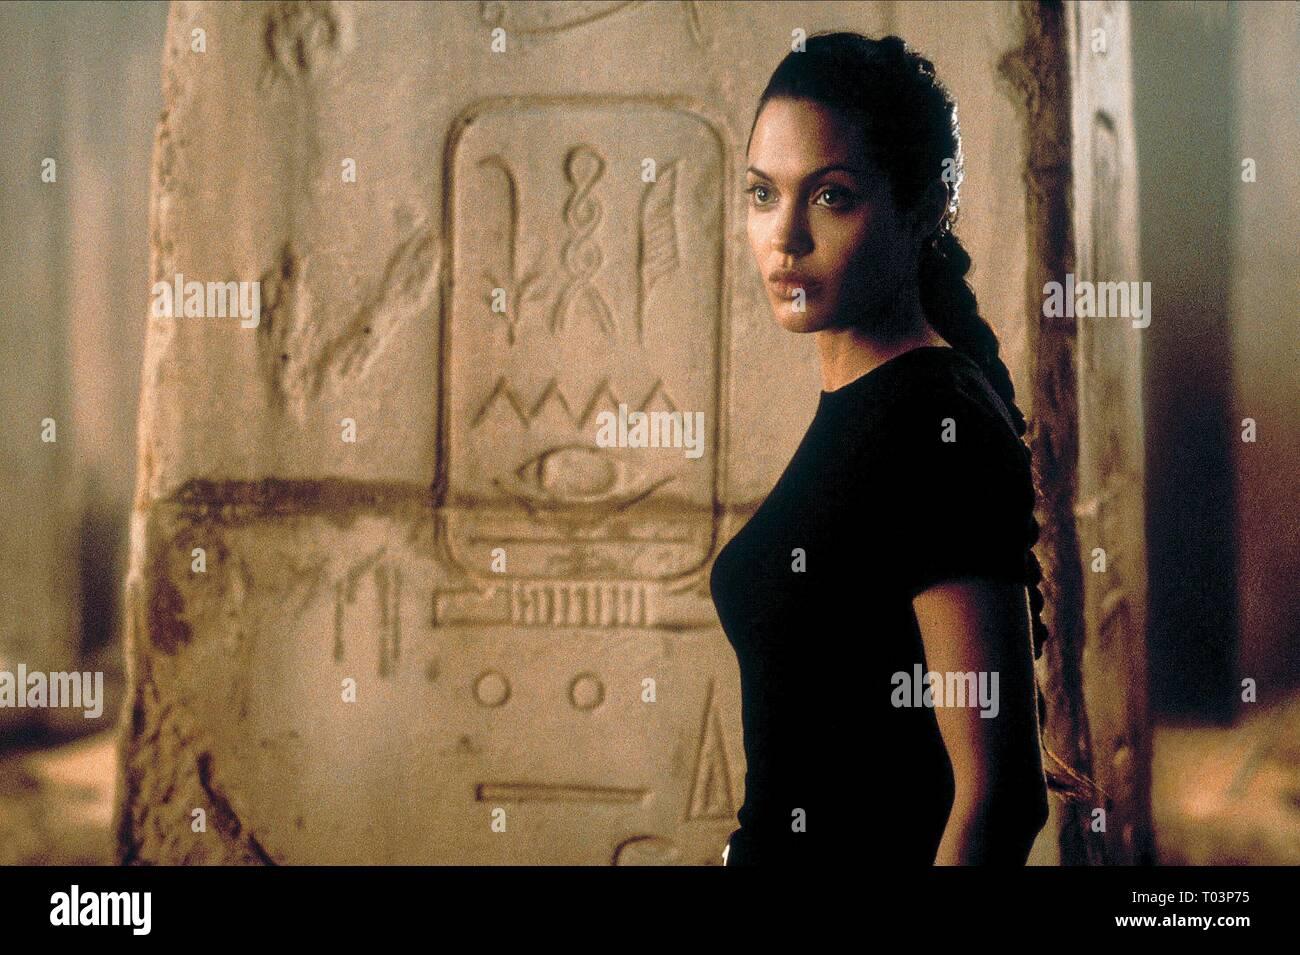 ANGELINA JOLIE, LARA CROFT: TOMB RAIDER, 2001 - Stock Image